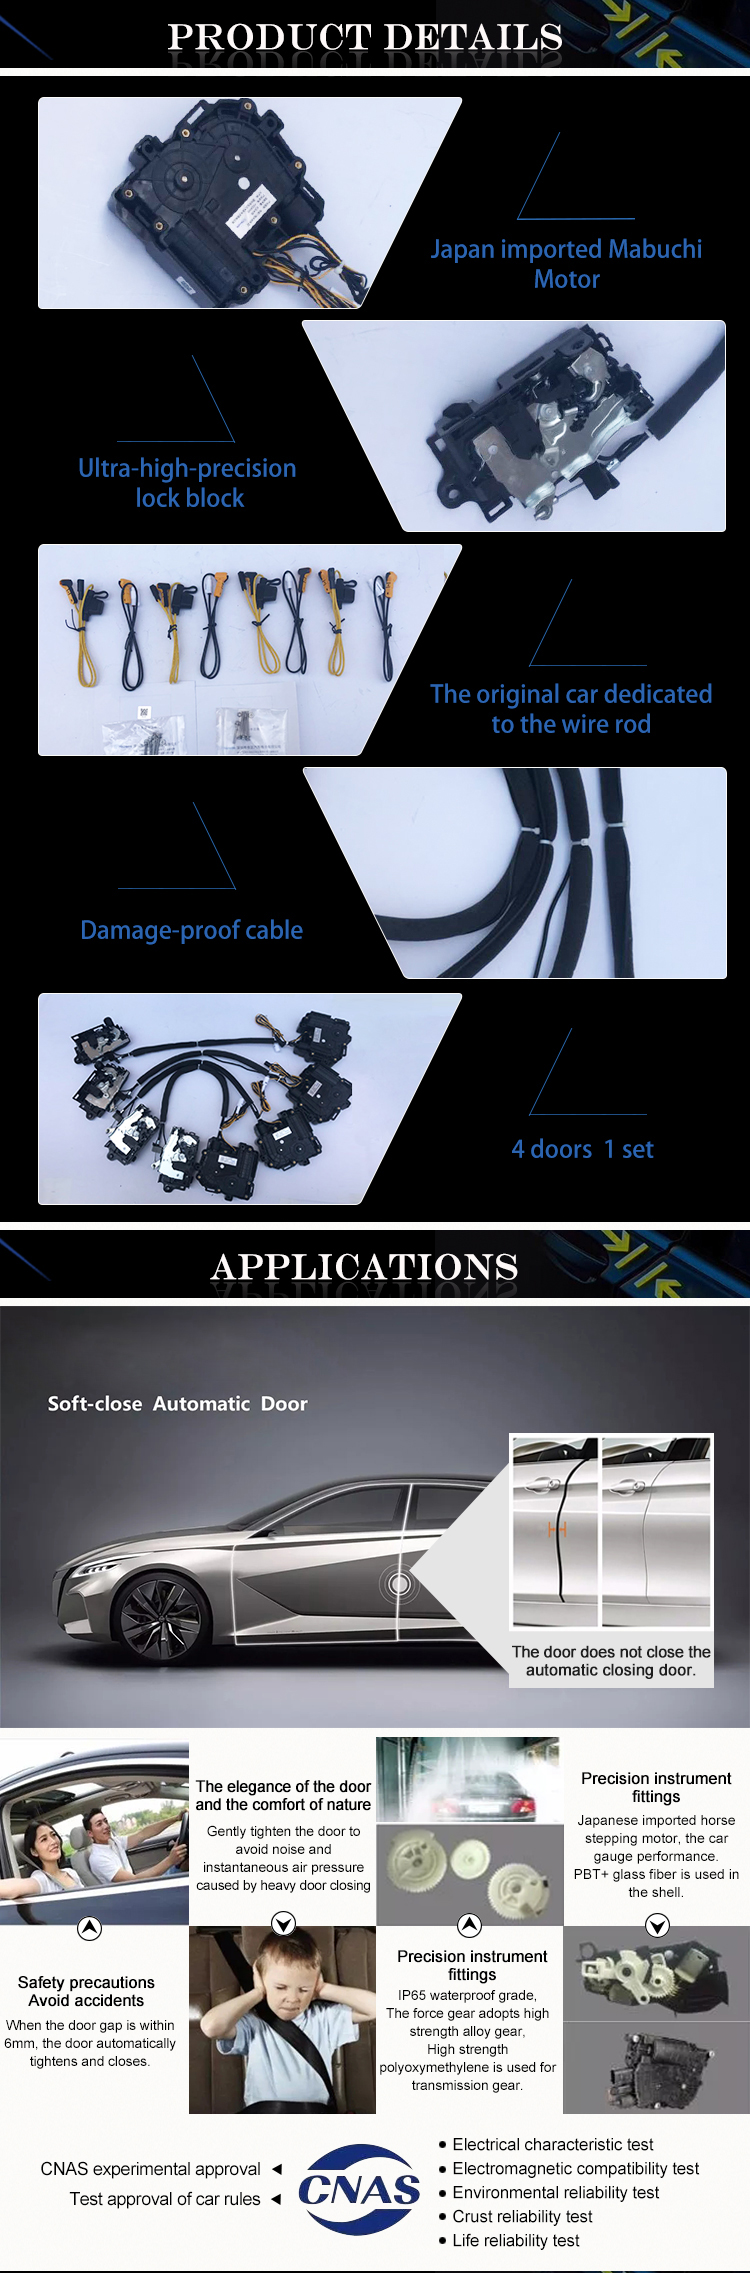 QISONG Car Models List of Automotive Electric Self Priming